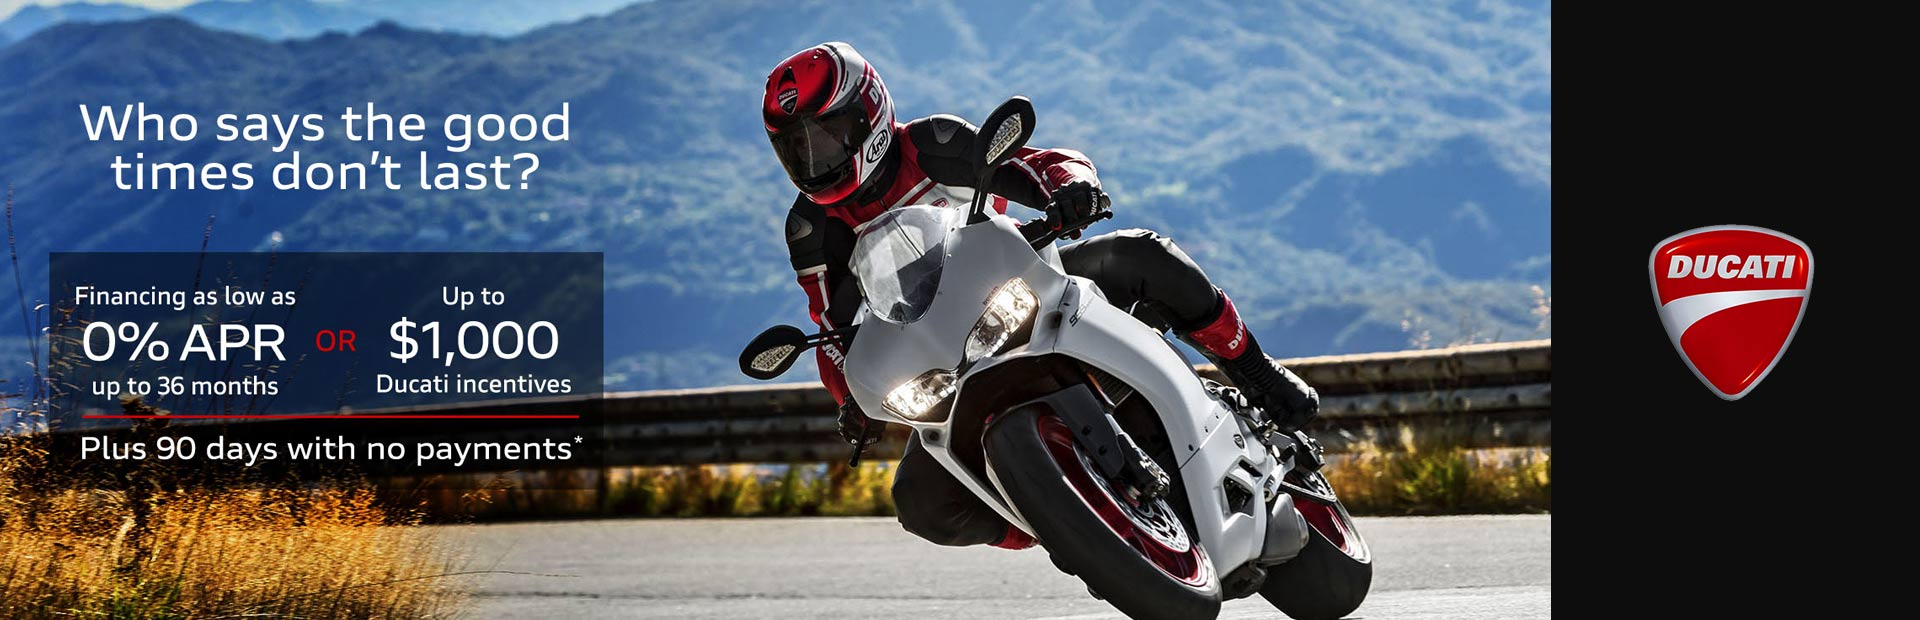 Authorized Ducati, Honda, KTM, And Honda Power Equipment Dealer The Motor  Cafe Sunnyvale, CA (800) 555 5547